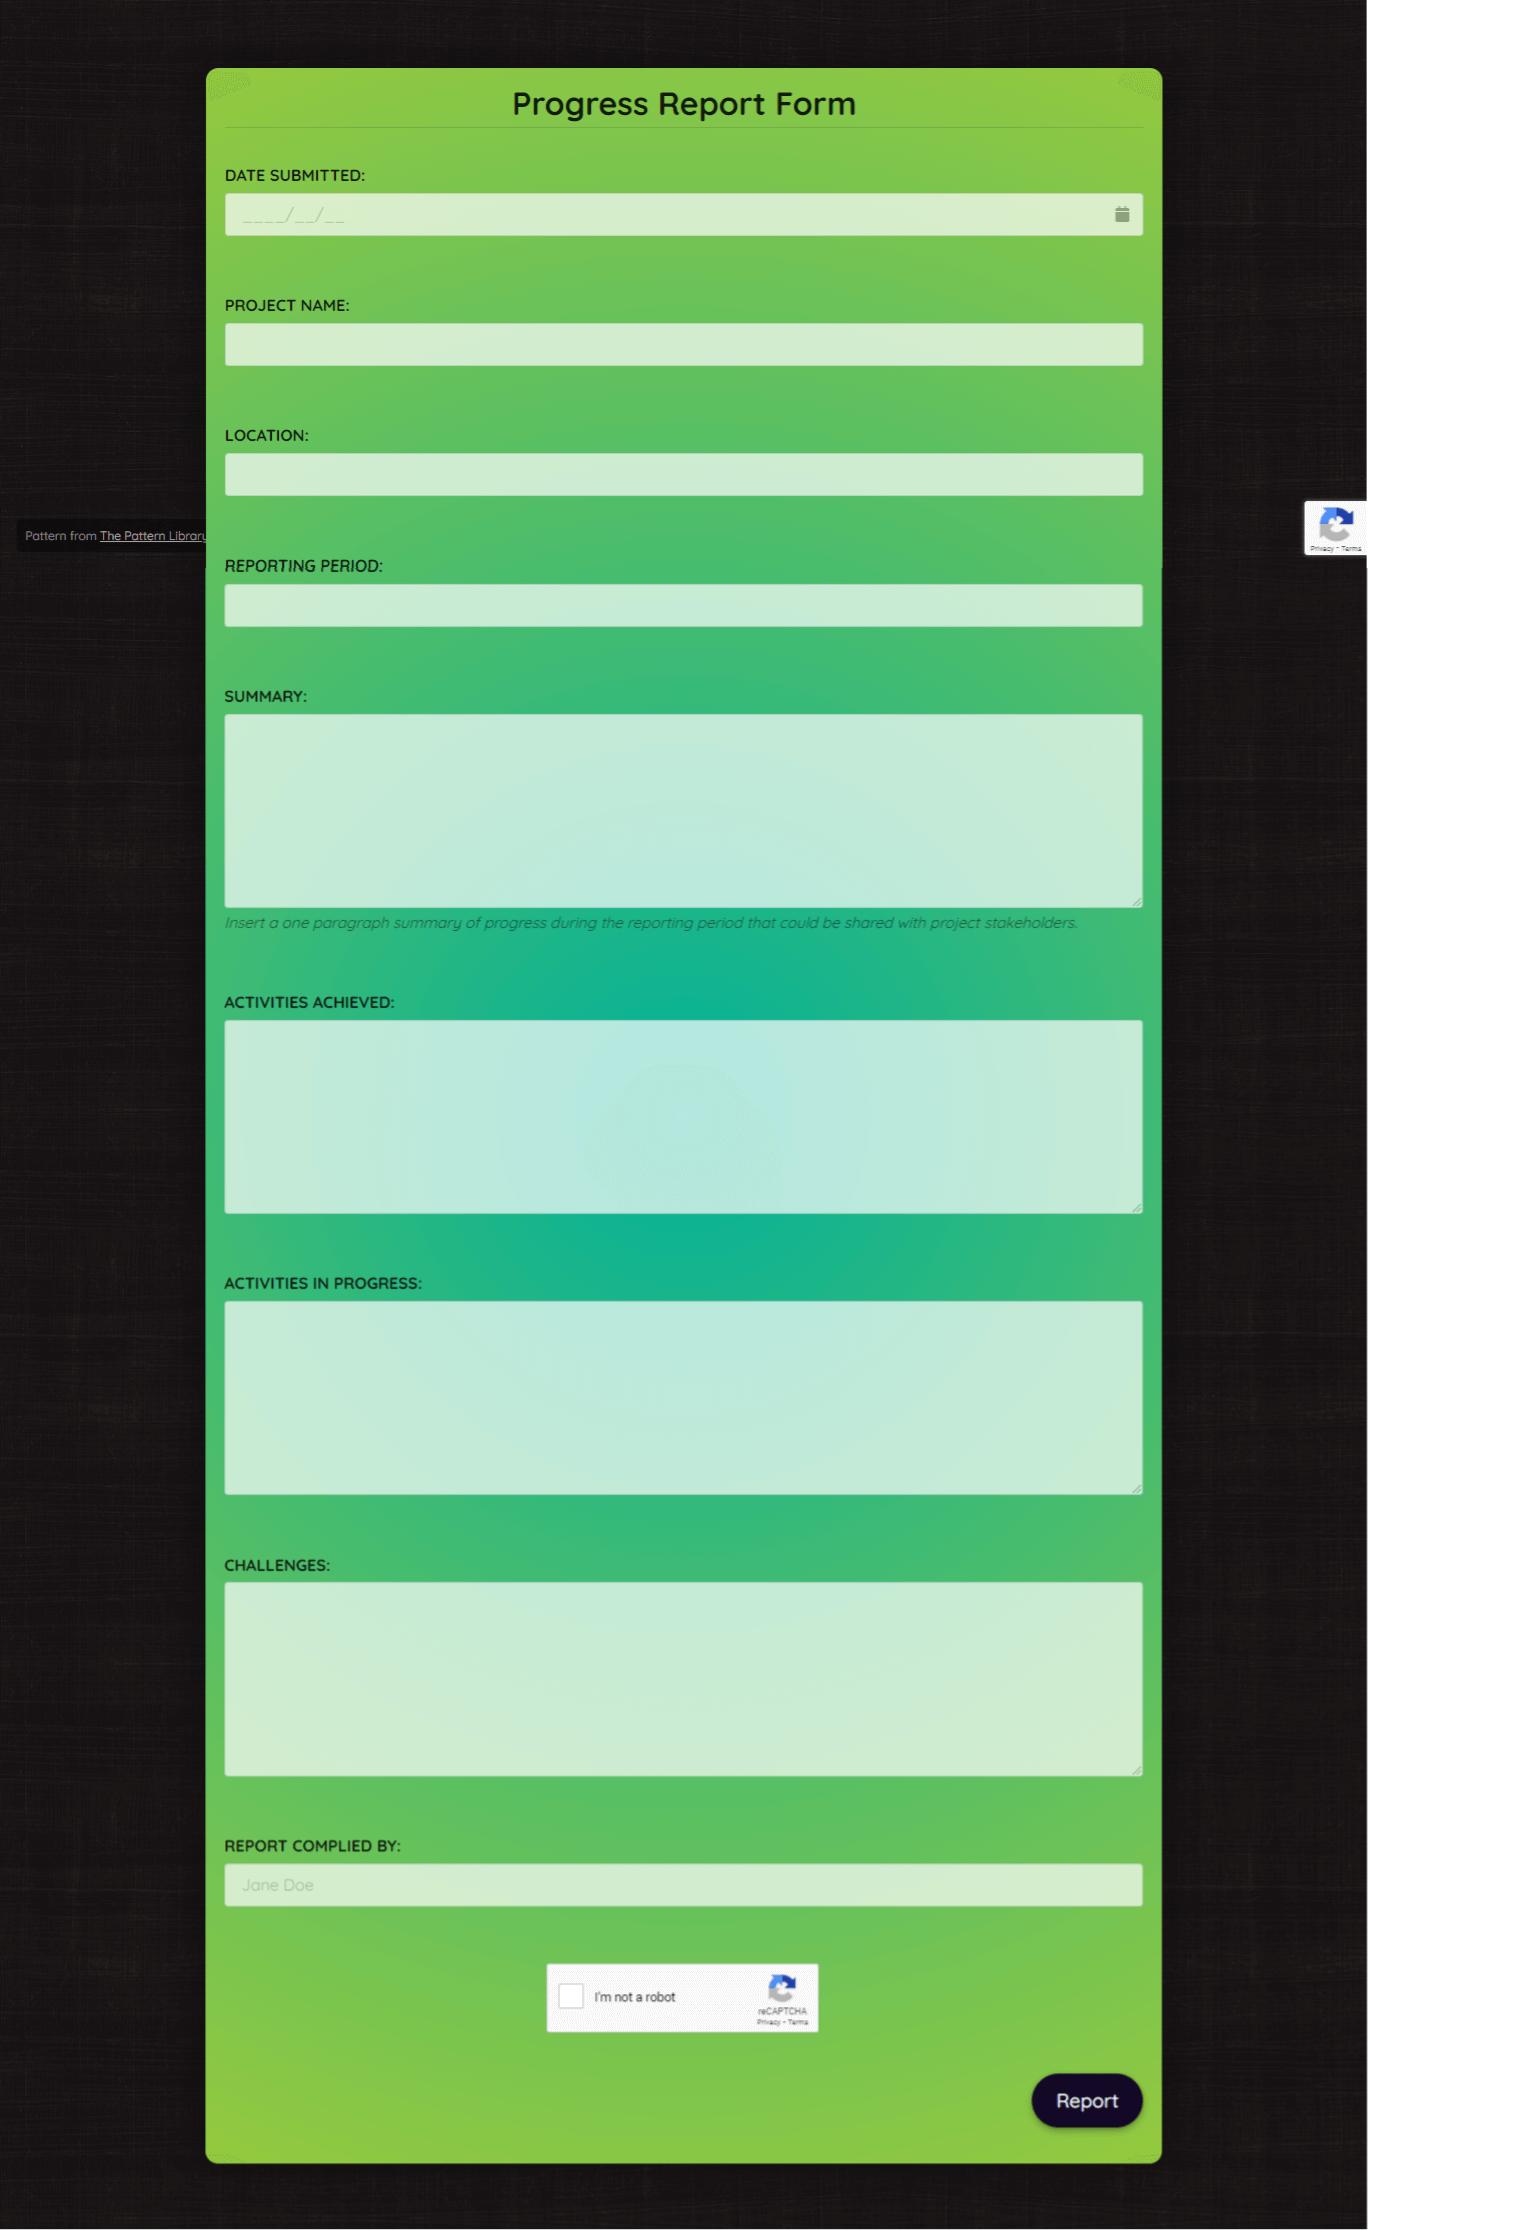 Progress Report Form Template template